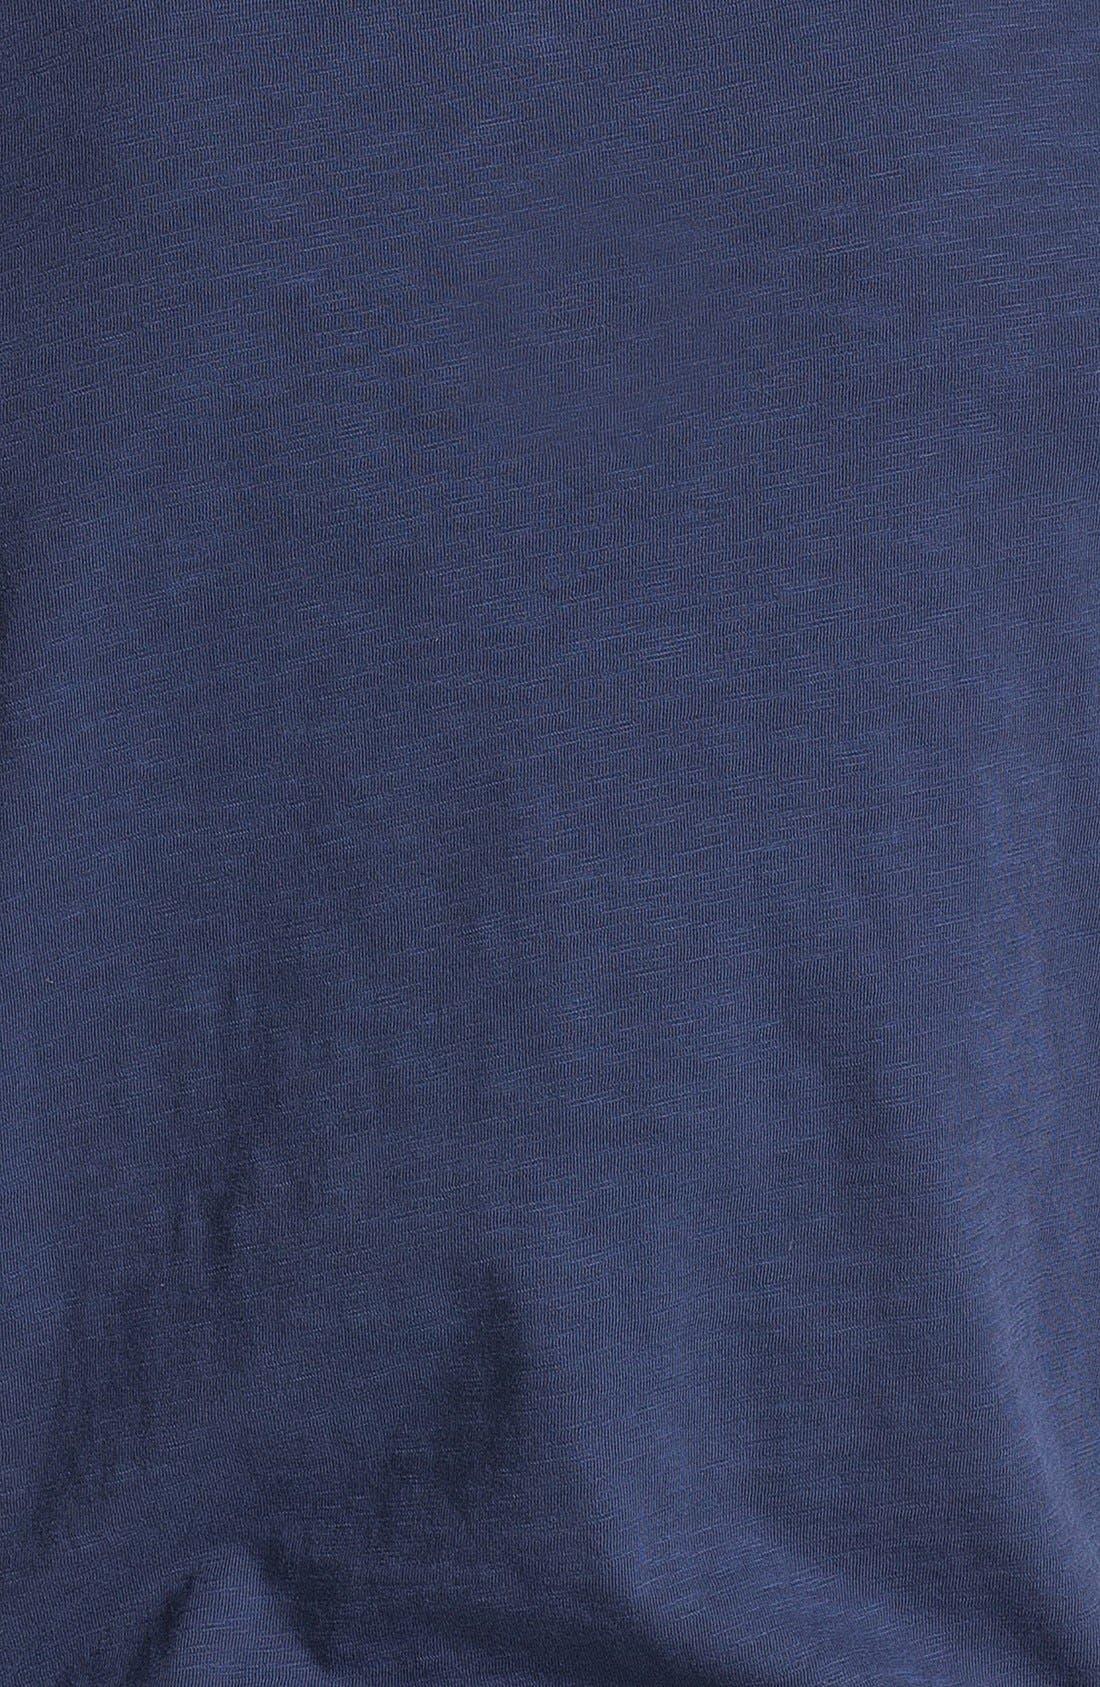 Alternate Image 3  - Façonnable Tailored Denim Henley